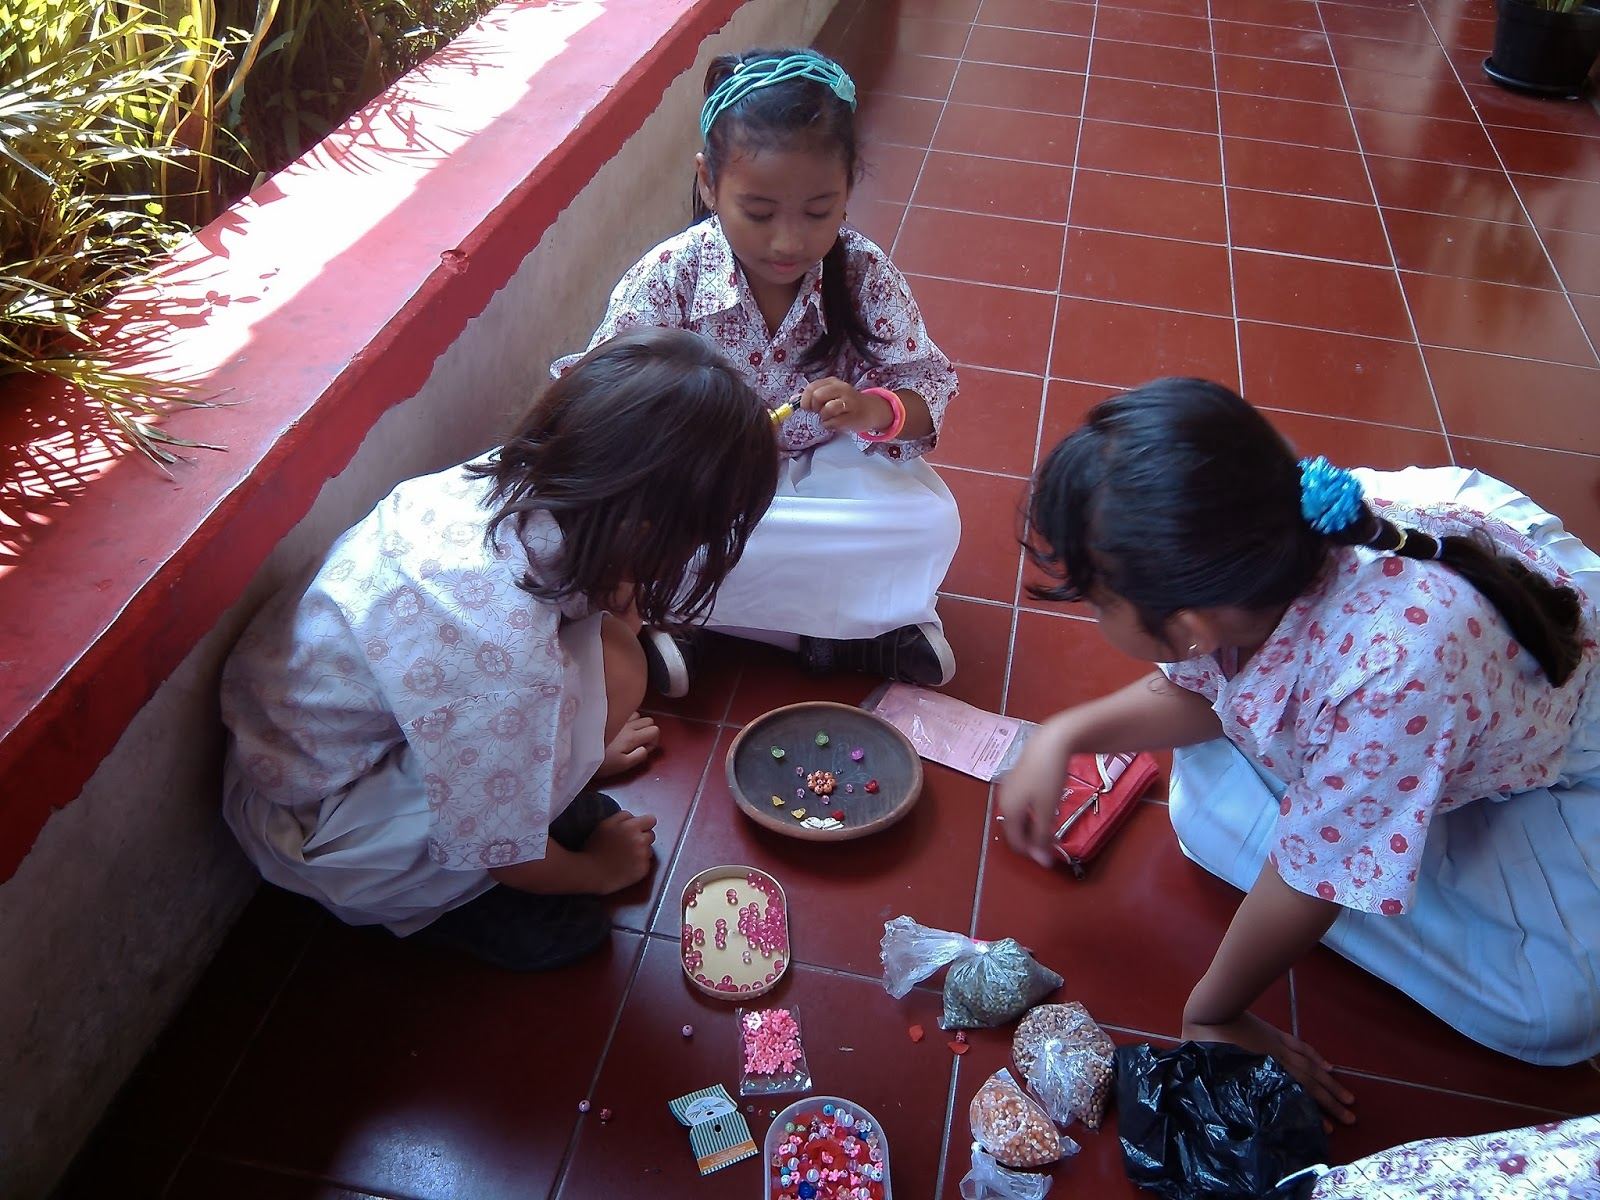 Pembelajaran Praktek Prakarya Website Resmi Sd Negeri 1 Patukangan Kendal